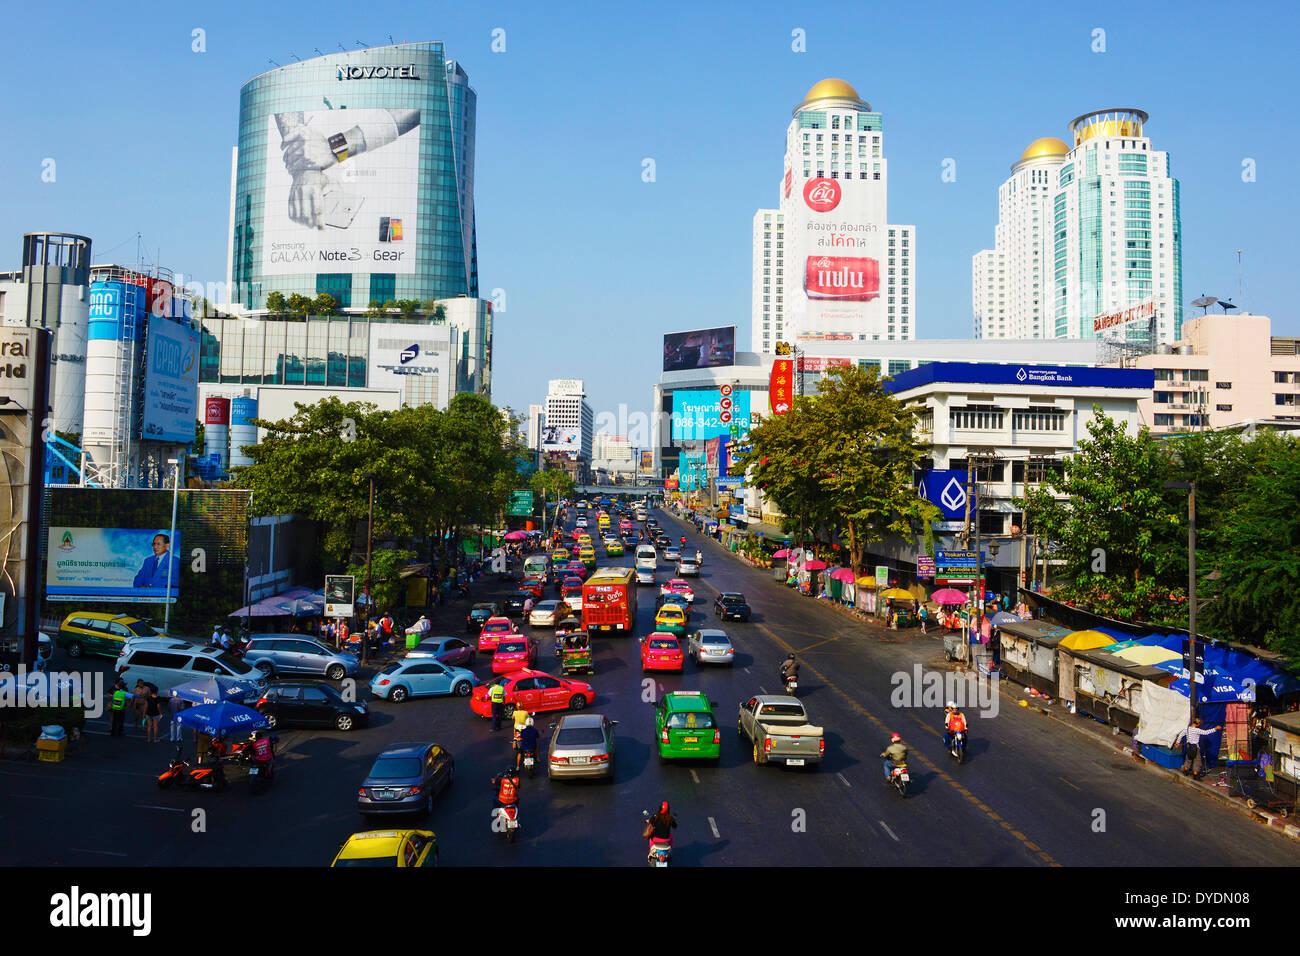 Thailand, Bangkok, Siam Square area, Rajprarop road - Stock Image